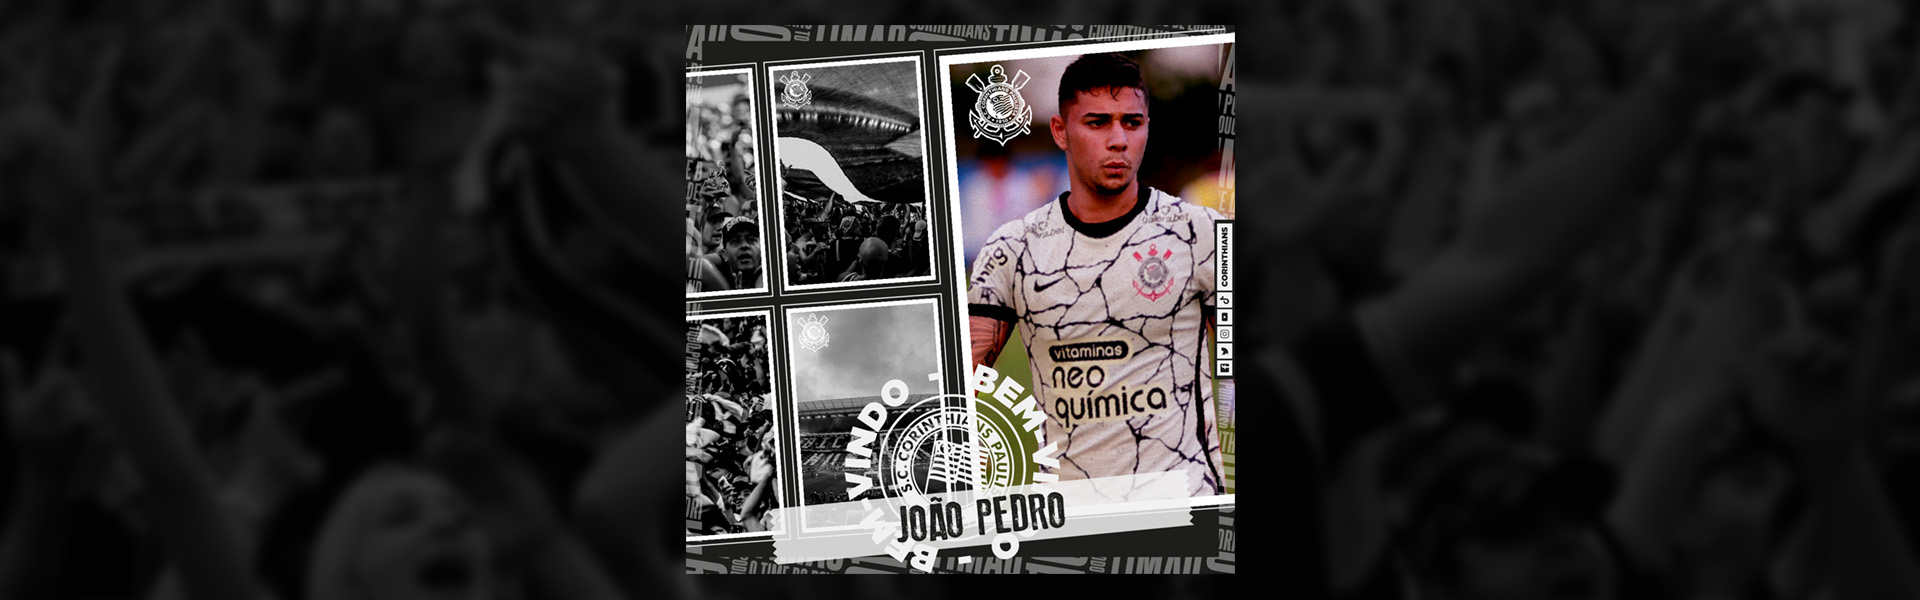 Corinthians contrata lateral João Pedro por empréstimo